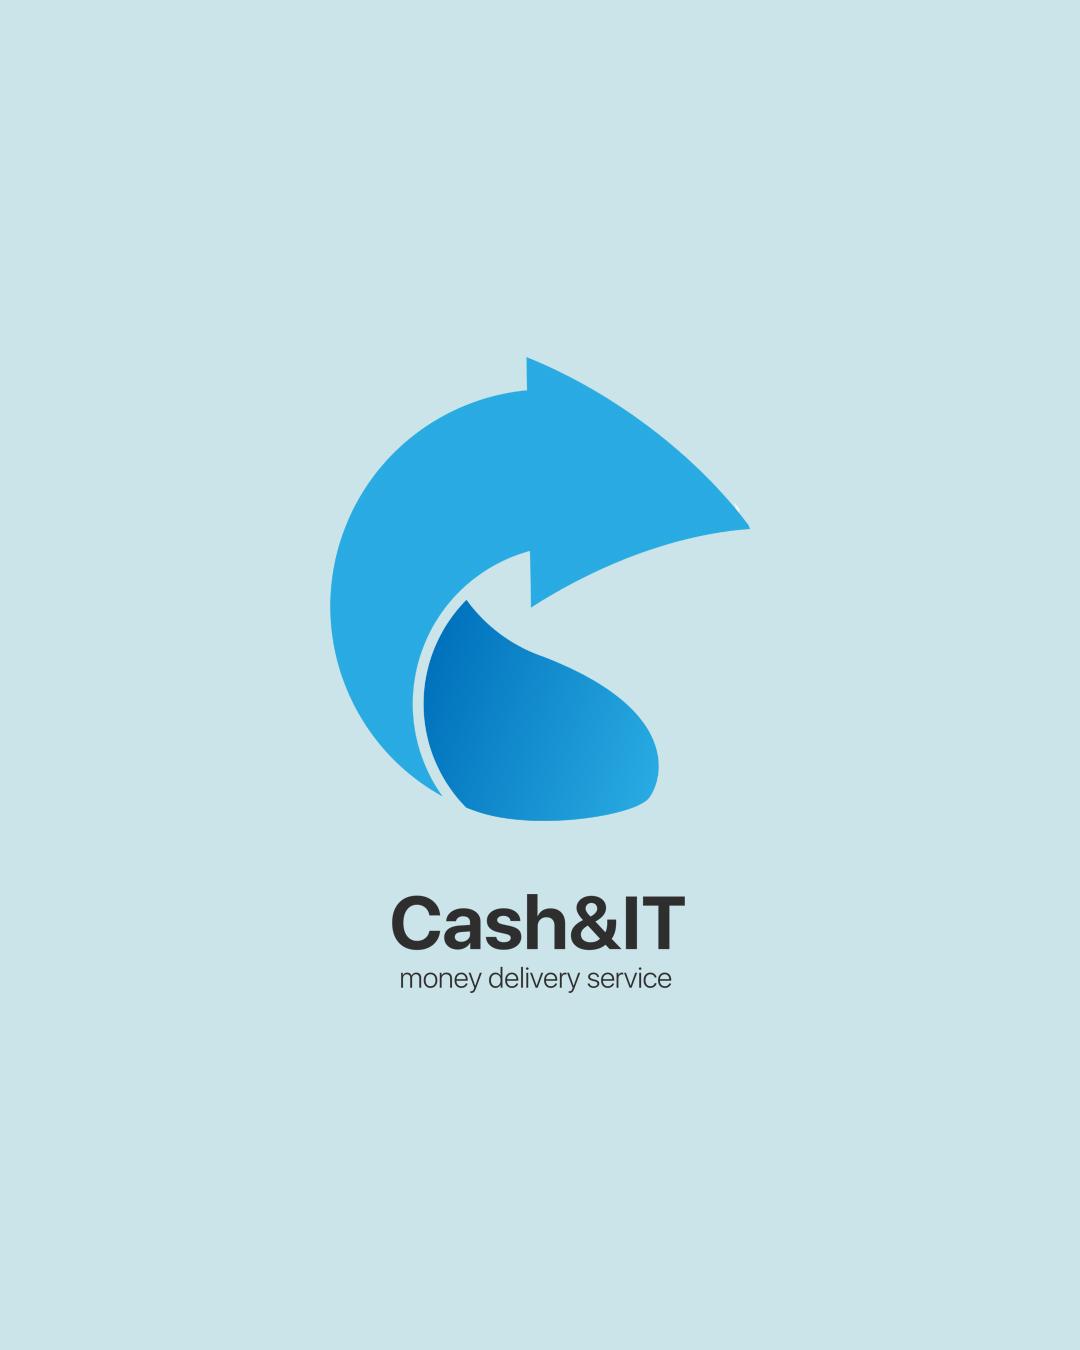 Логотип для Cash & IT - сервис доставки денег фото f_9565fda532d89ff9.jpg